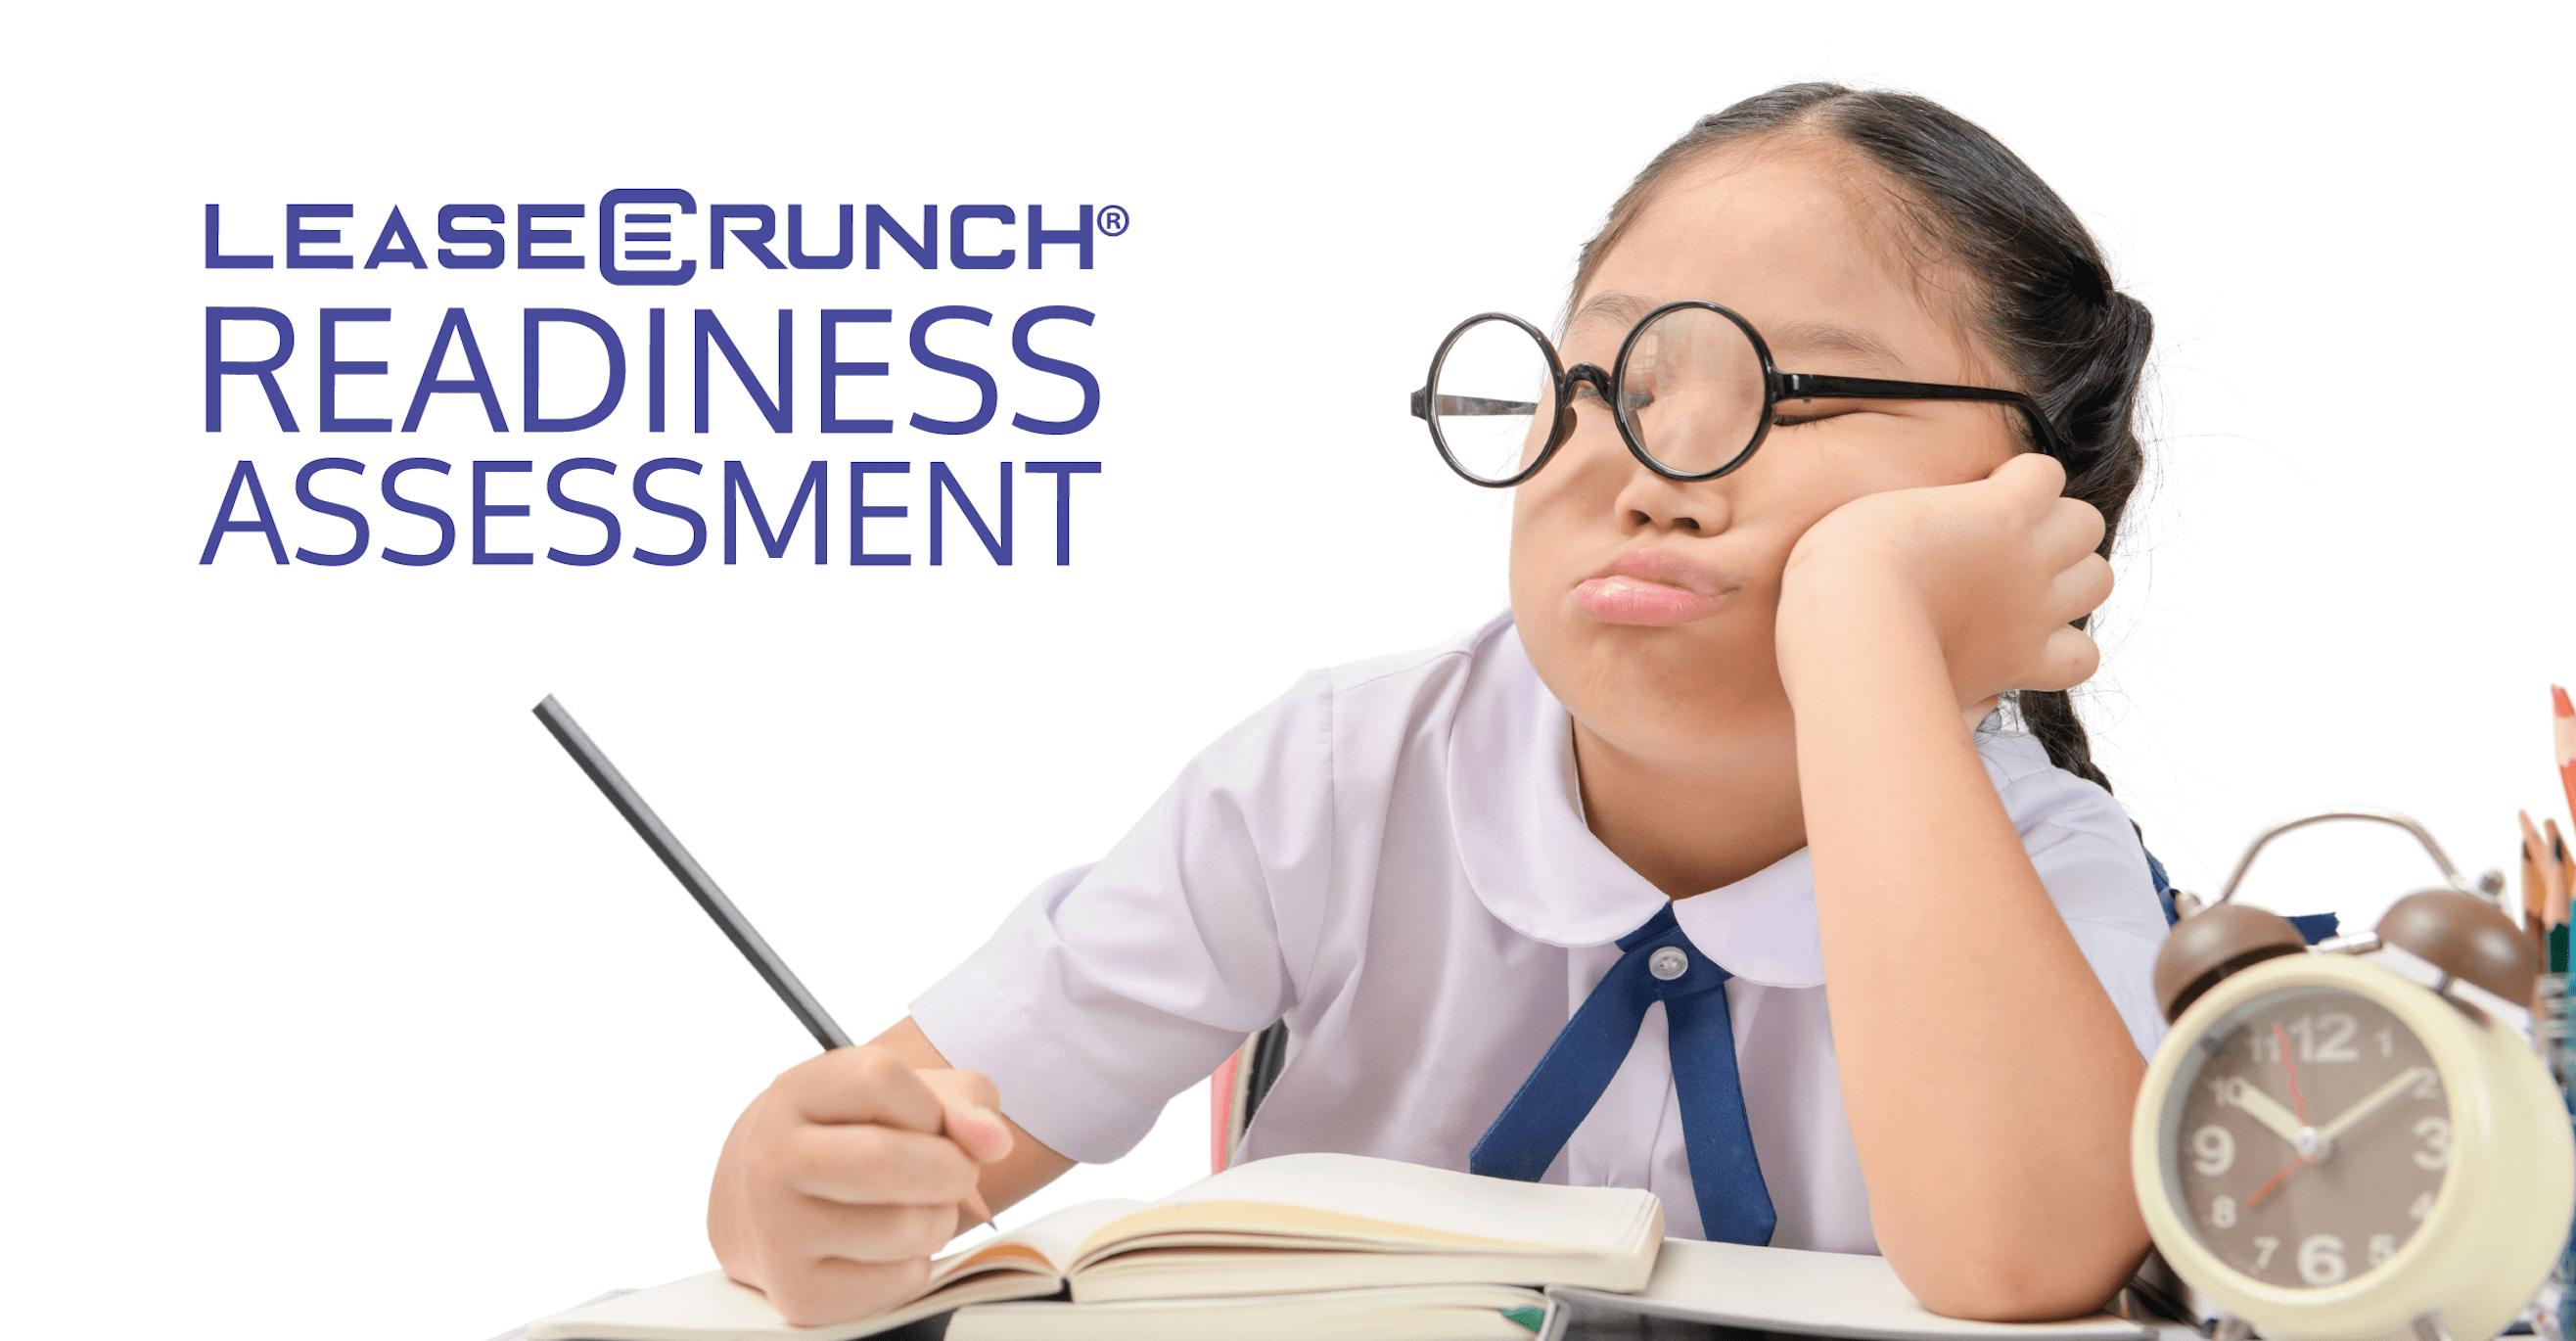 LeaseCrunch Readiness Assessment